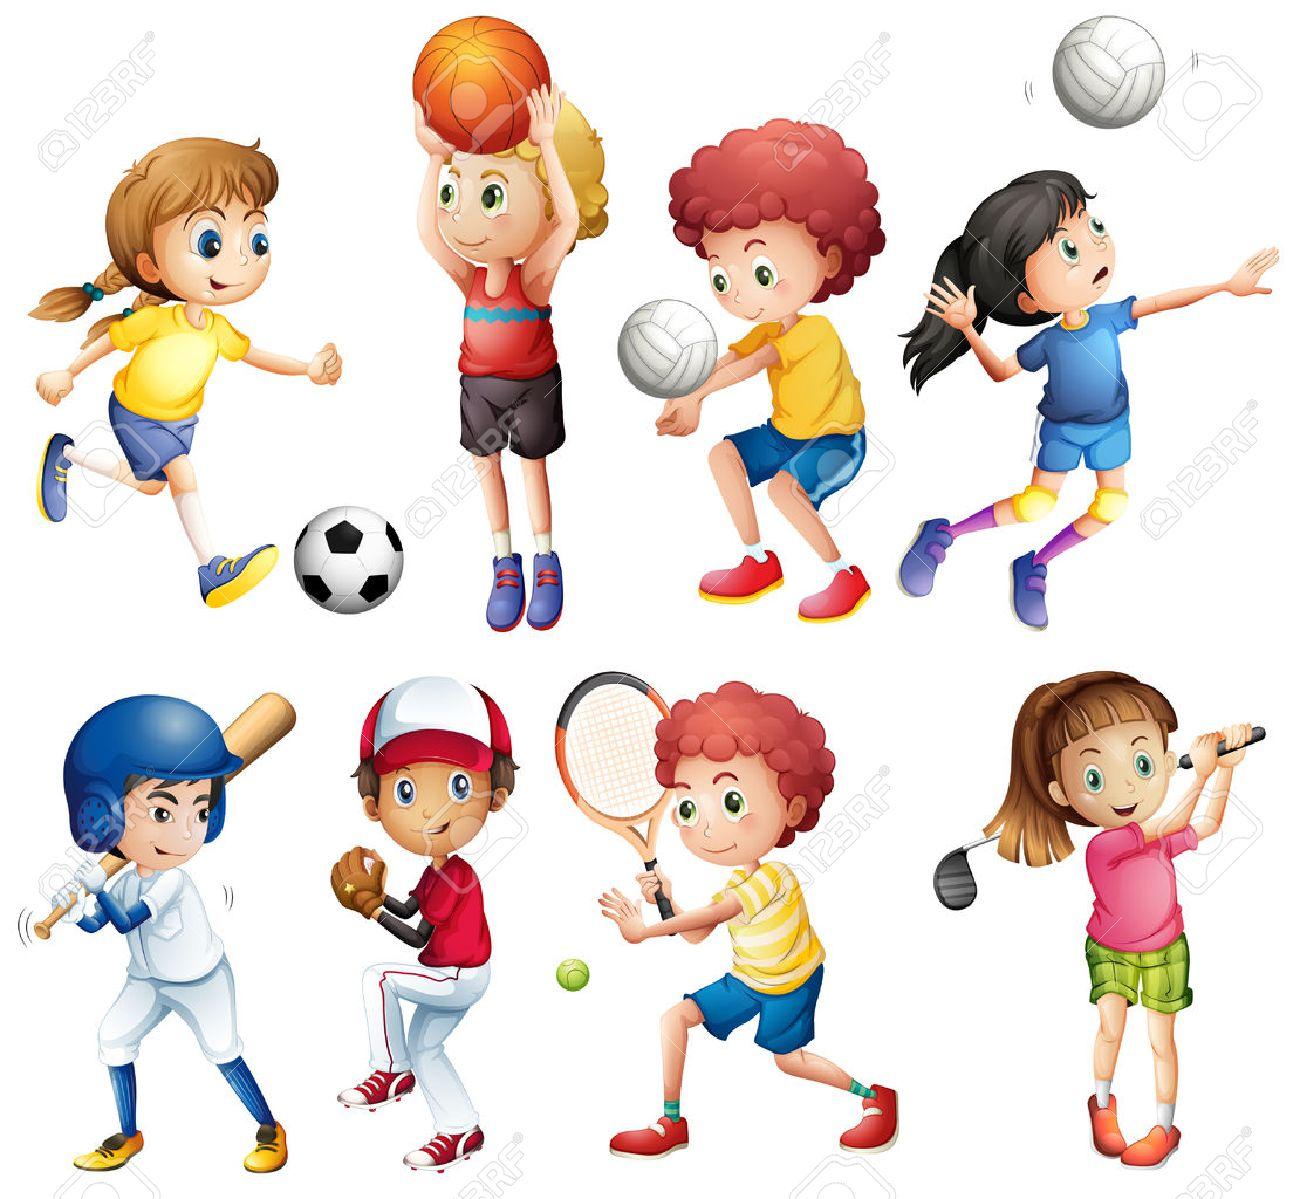 Children Sports Clipart.